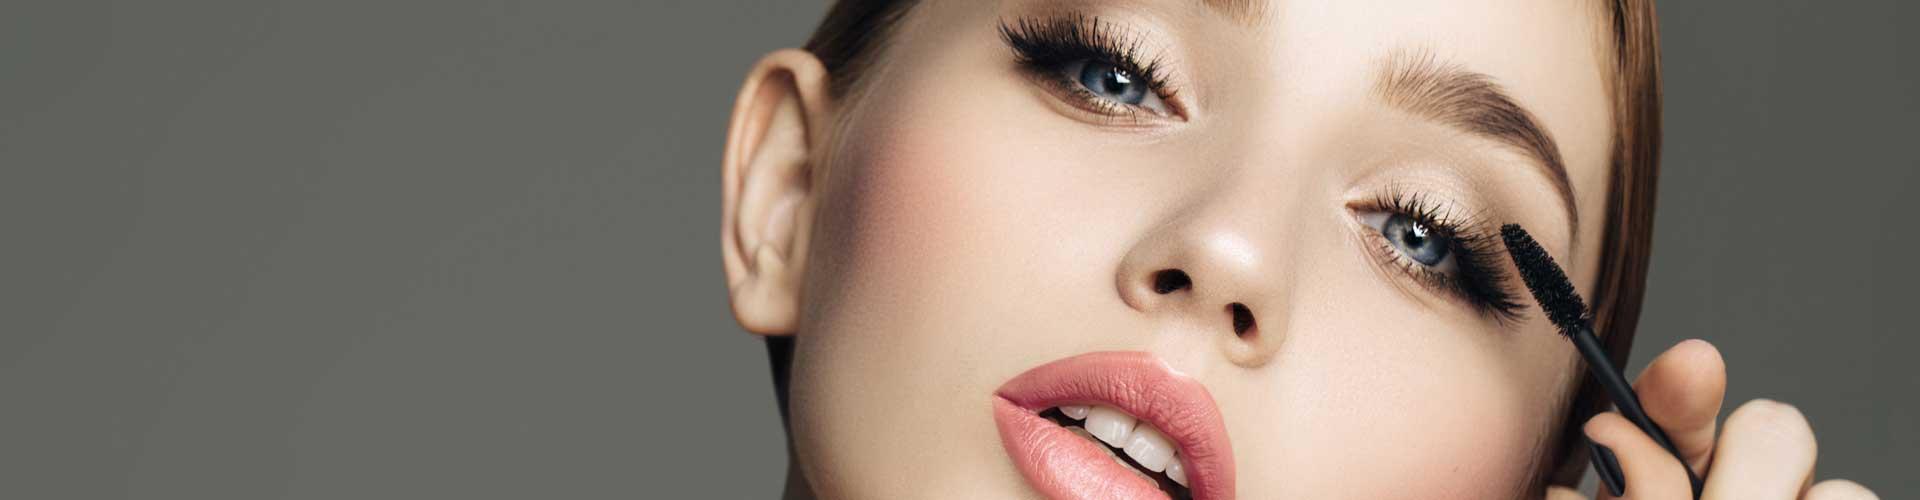 Eyelash Extensions _Cils France Eyelash Extensions